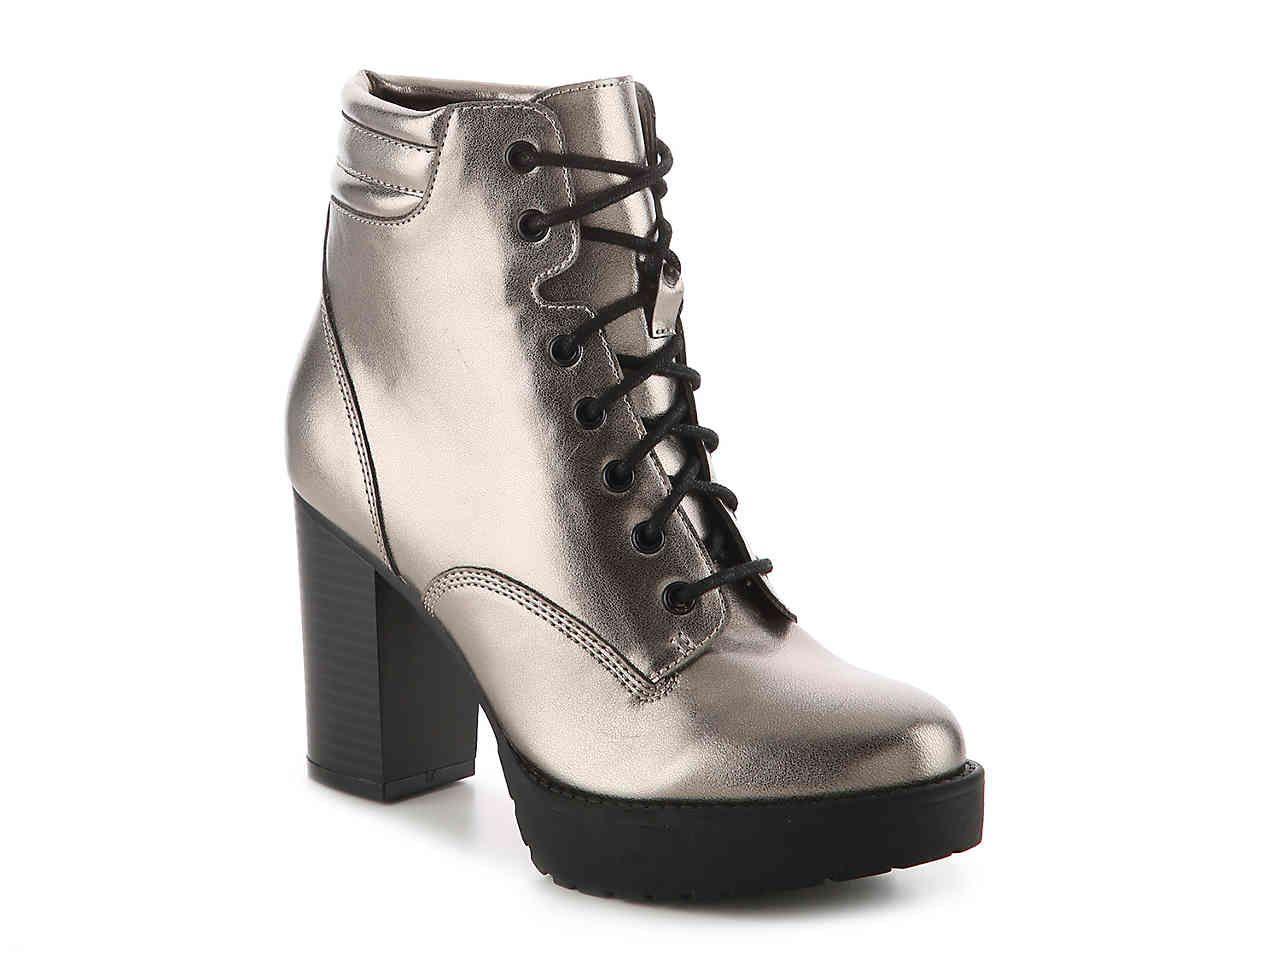 8ec01ac9eb08 Madden Girl Joltz Bootie in Pewter Metallic Women s Shoes